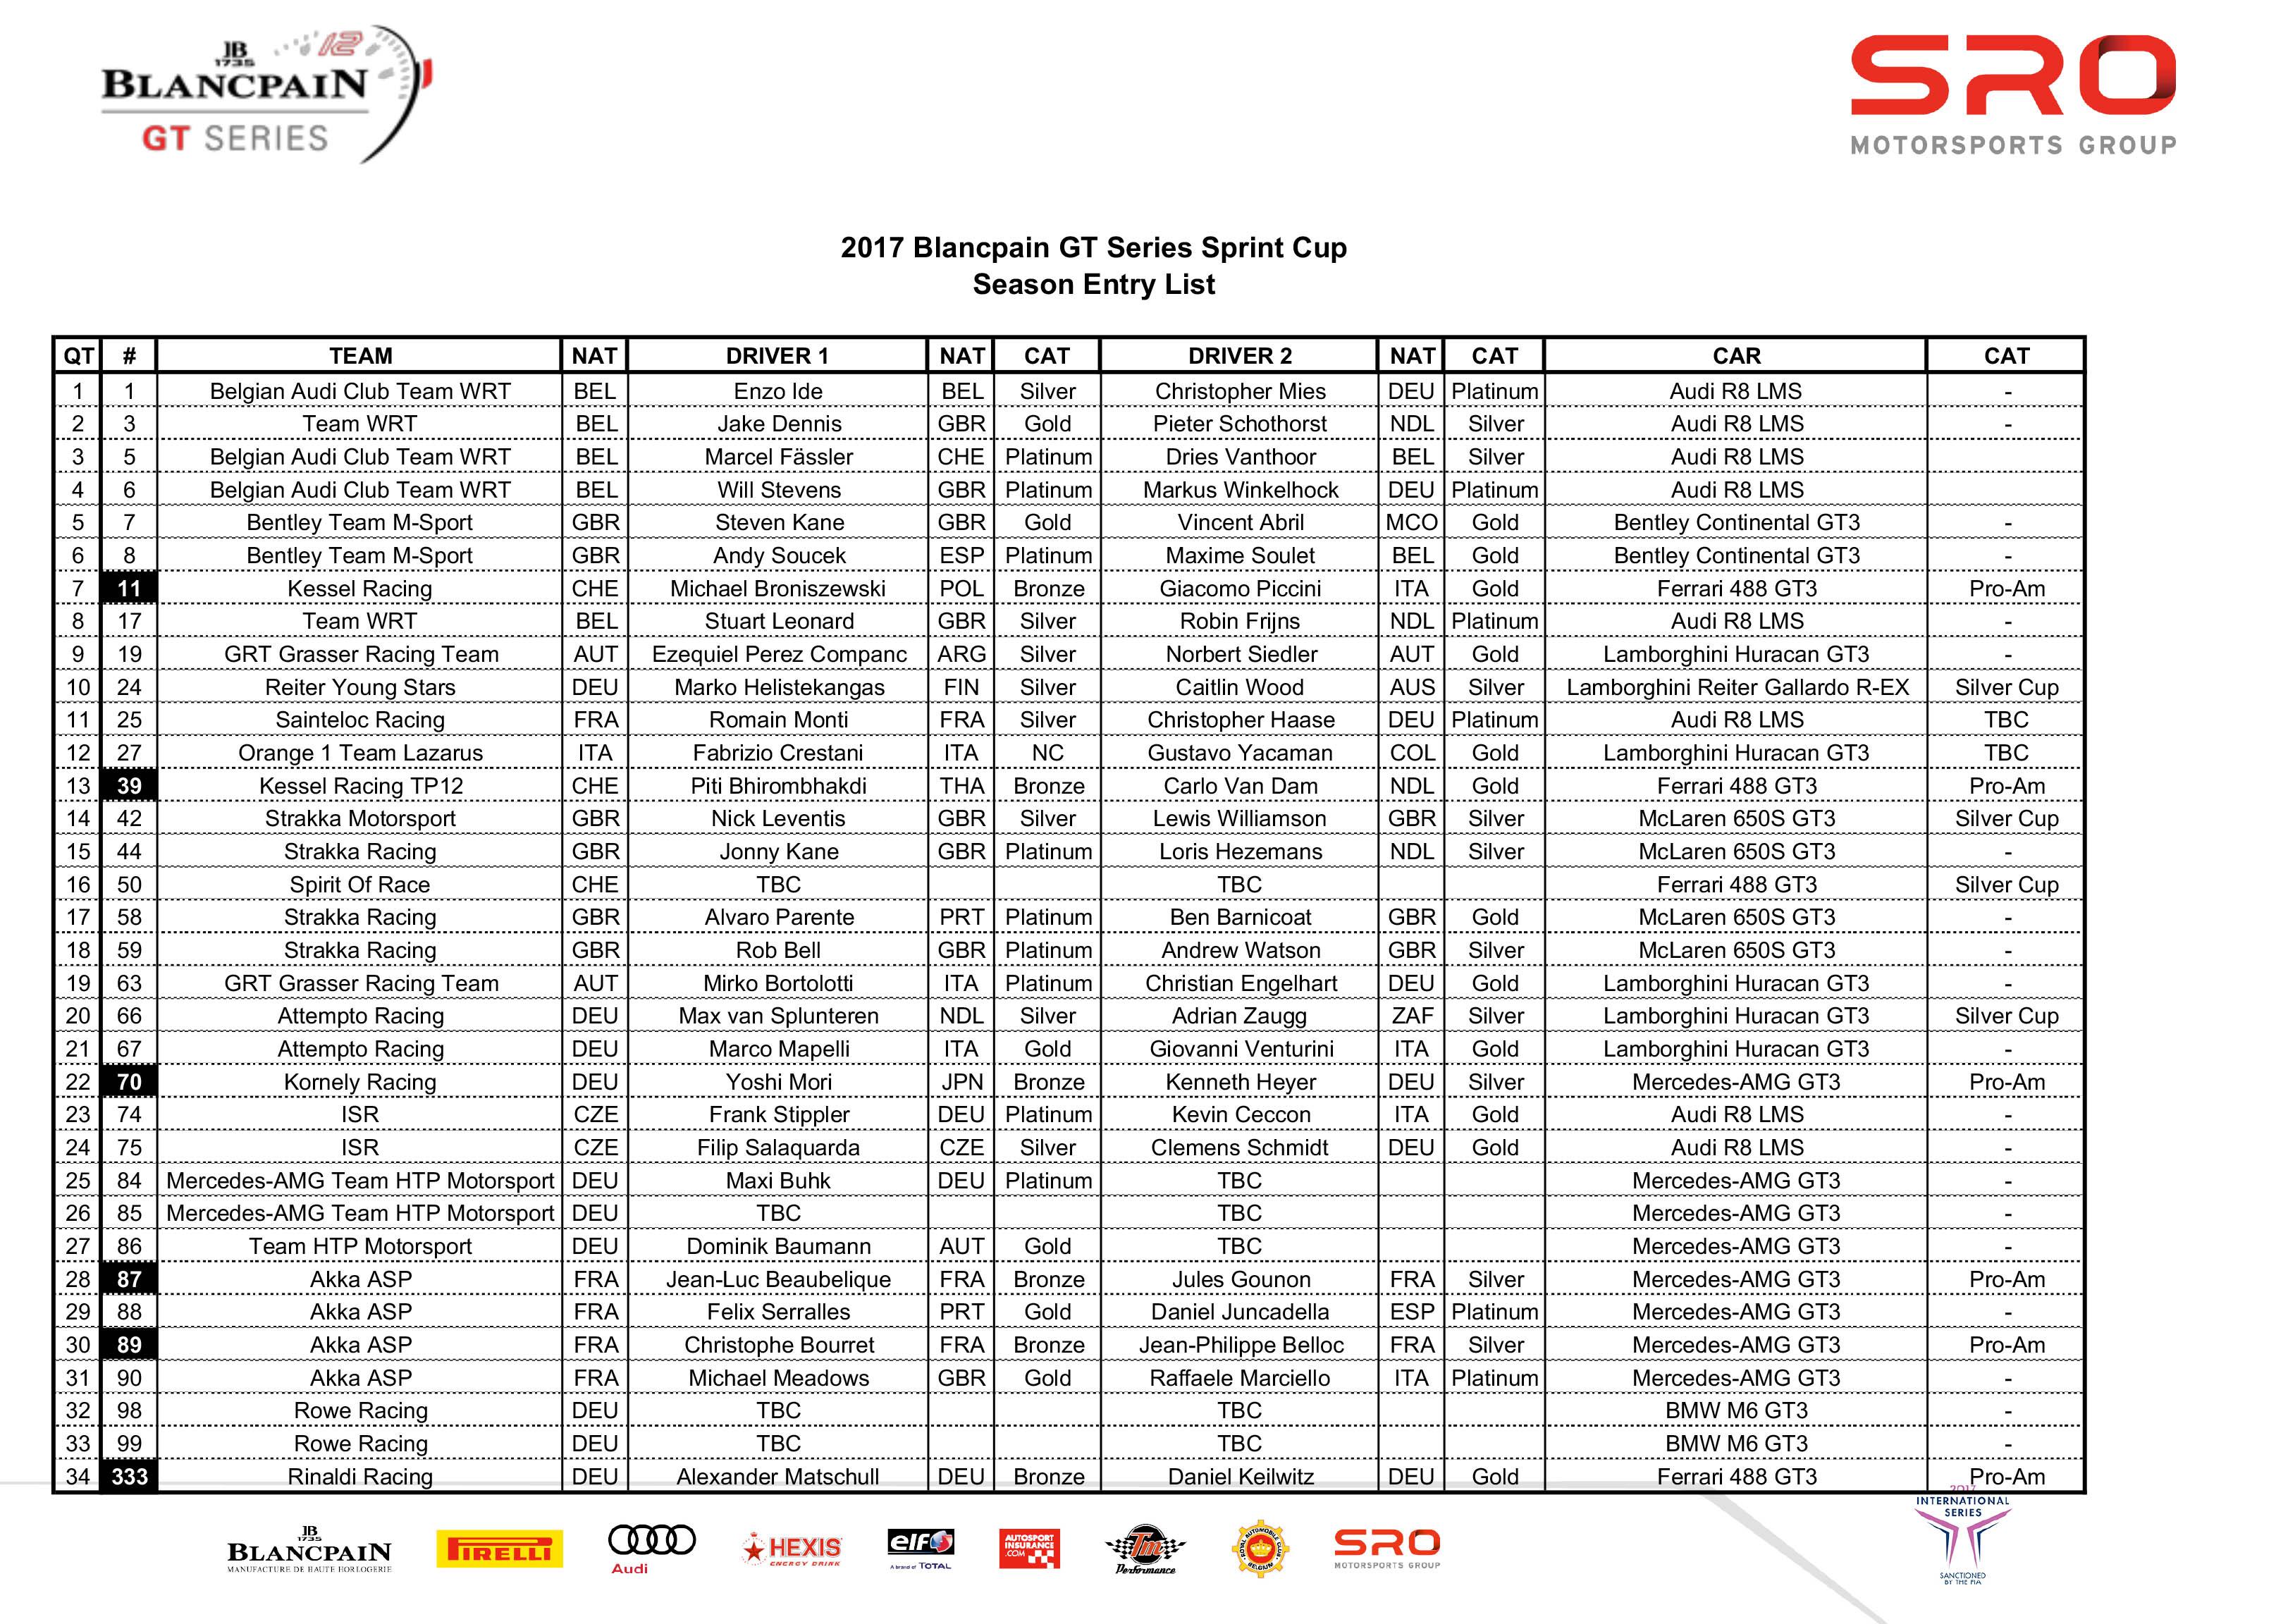 2017_BPGT_Sprint_Season_Entry_List.jpg